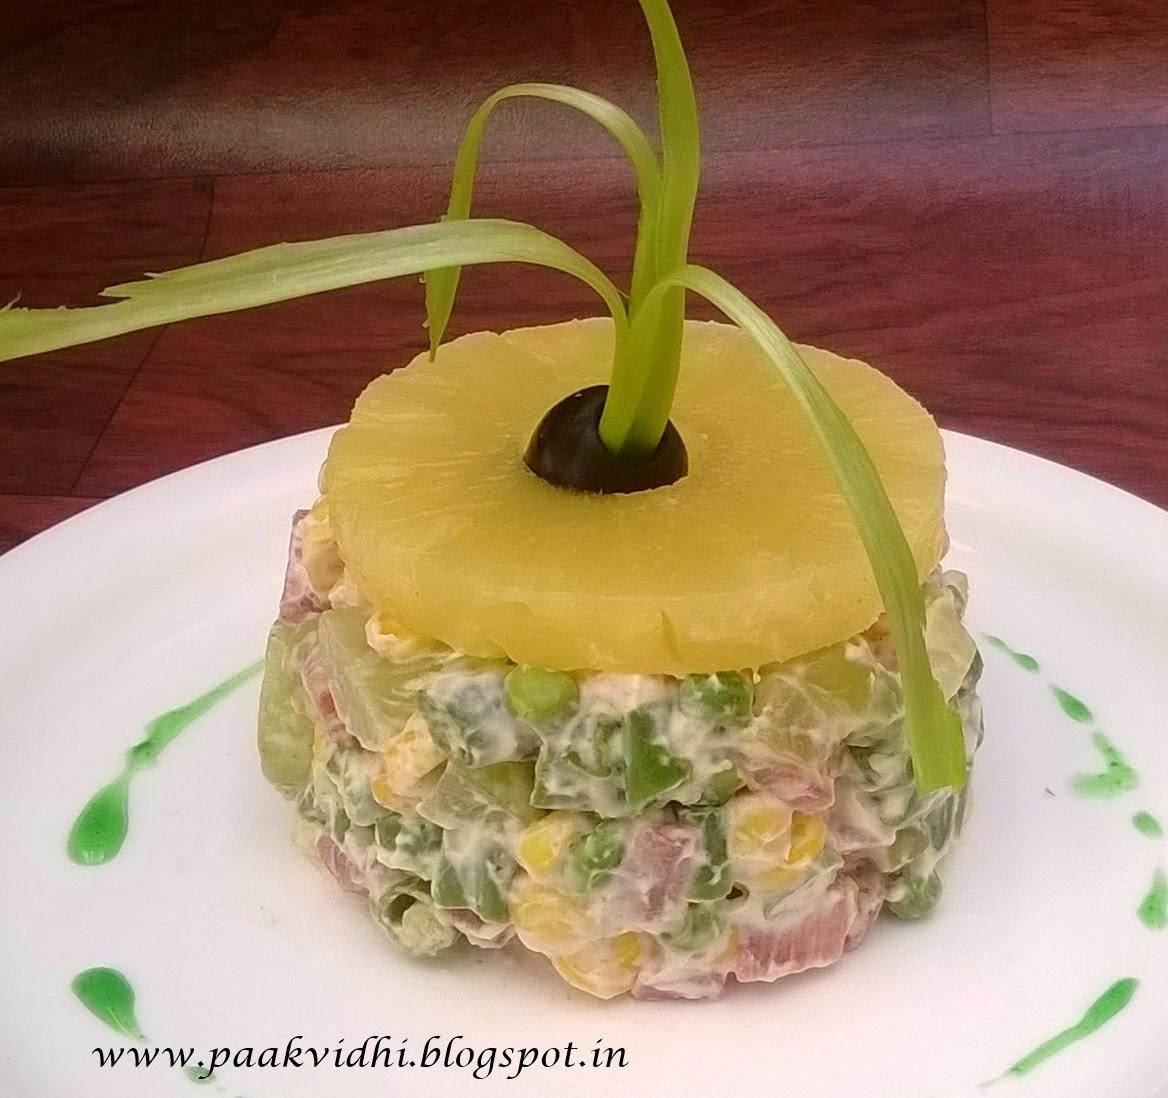 http://paakvidhi.blogspot.in/2014/03/russian-salad.html